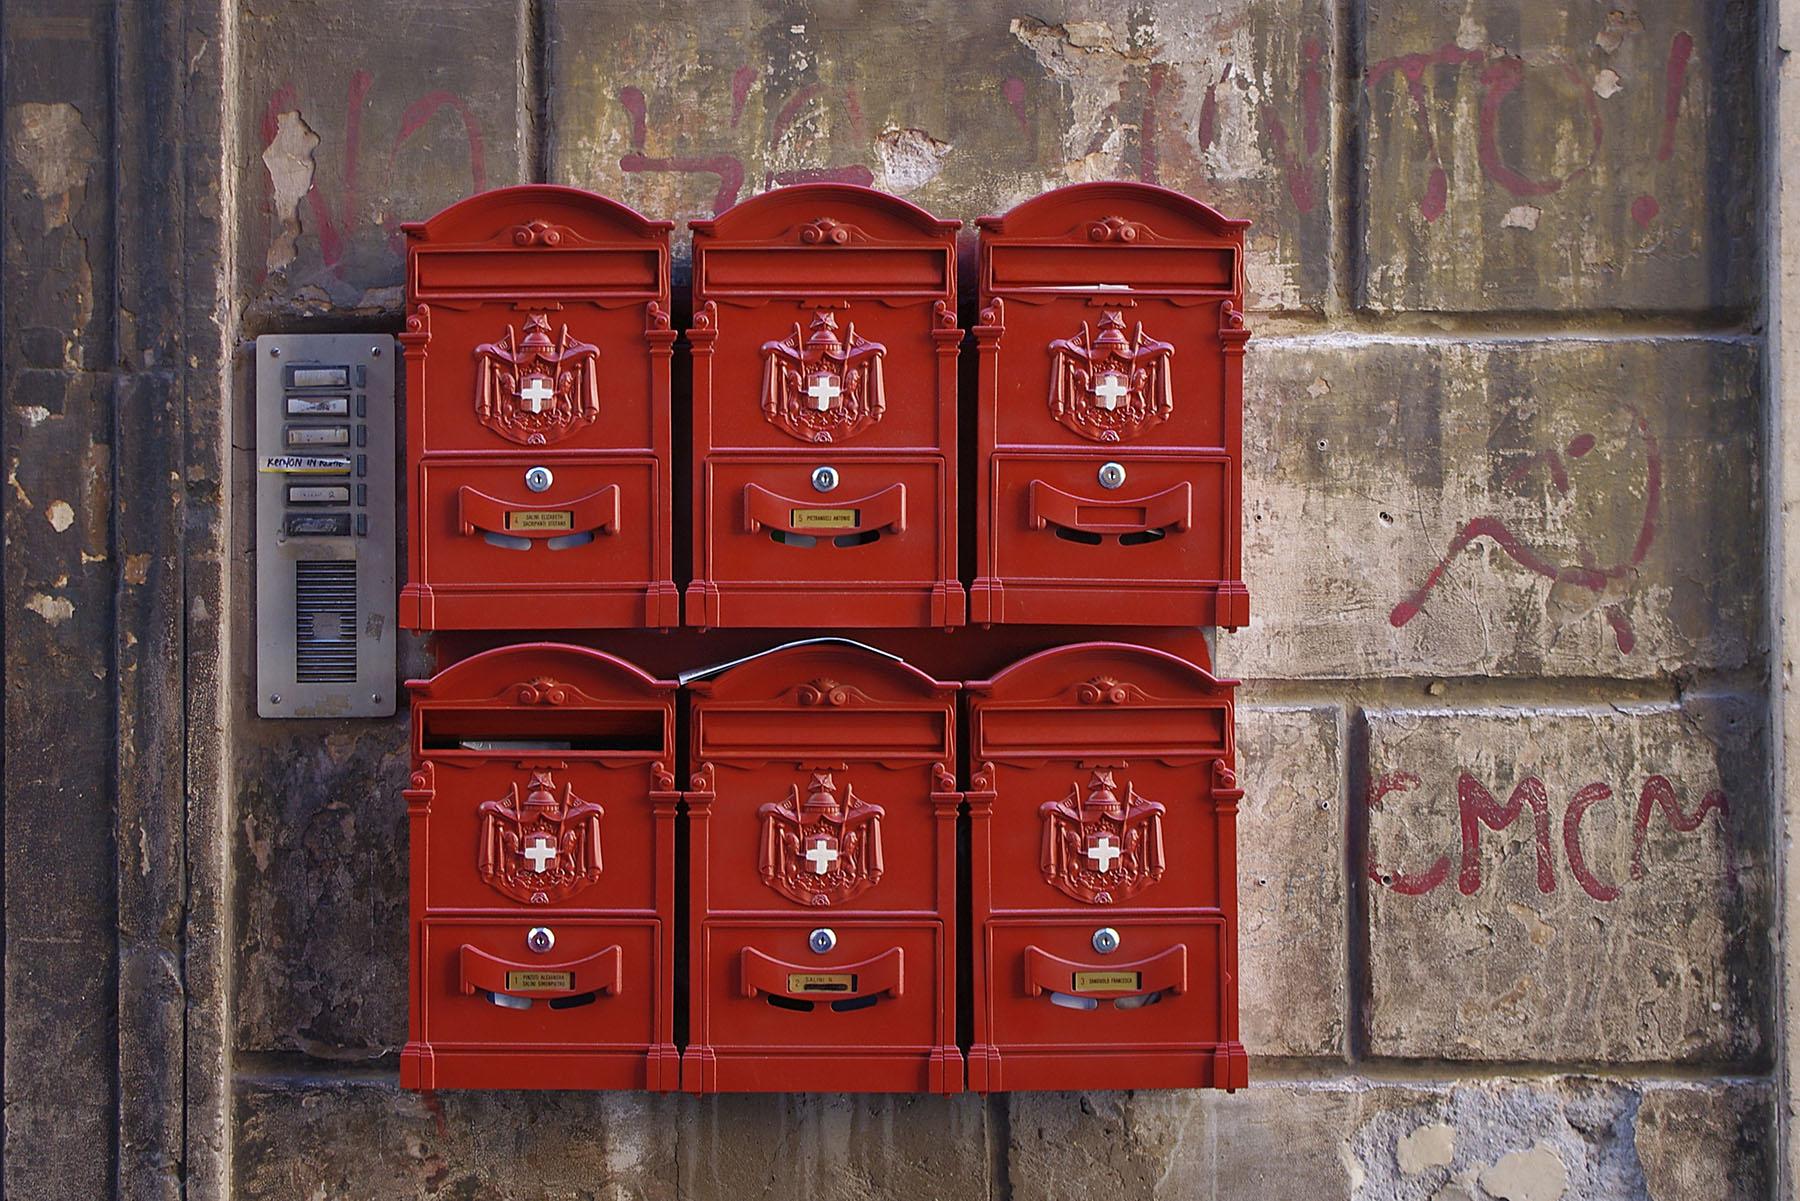 Sneak Peek: Refining the New Groove Inbox